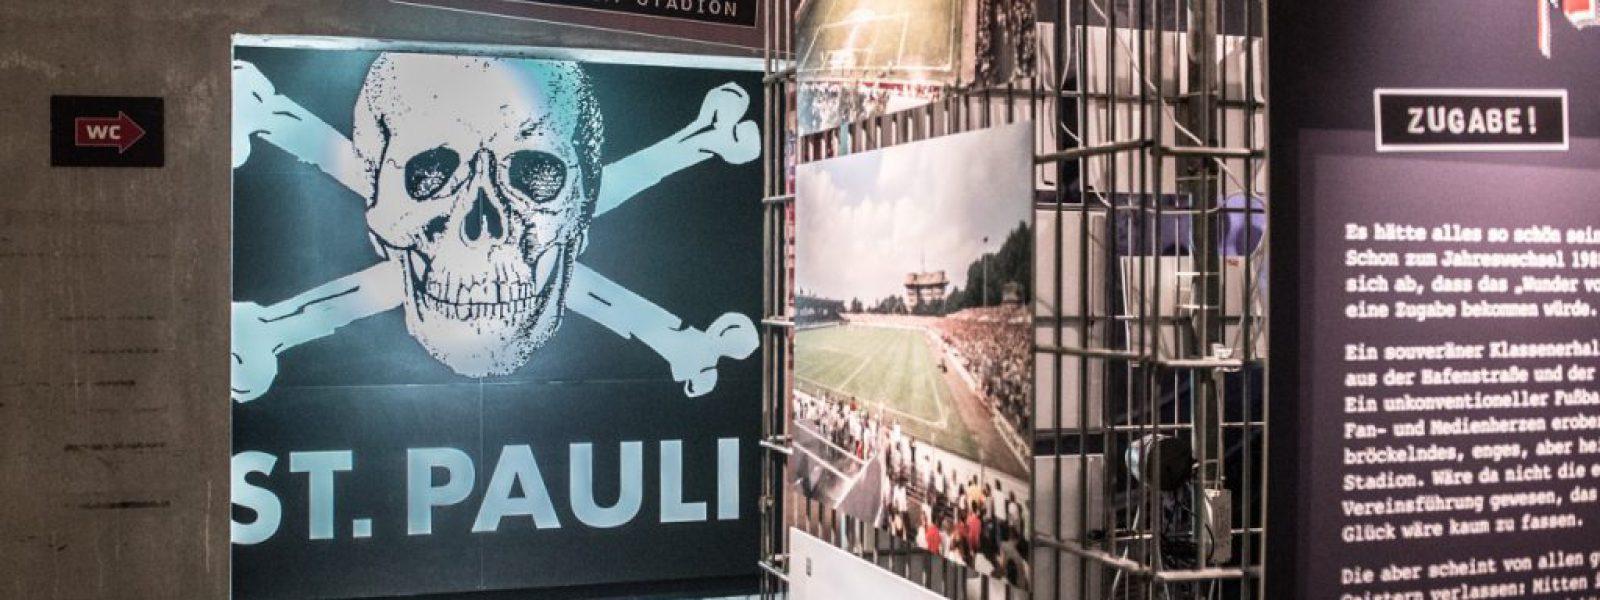 Eroeffnung FC St Pauli Museum (Foto Sabrina Adeline Nagel) - 33